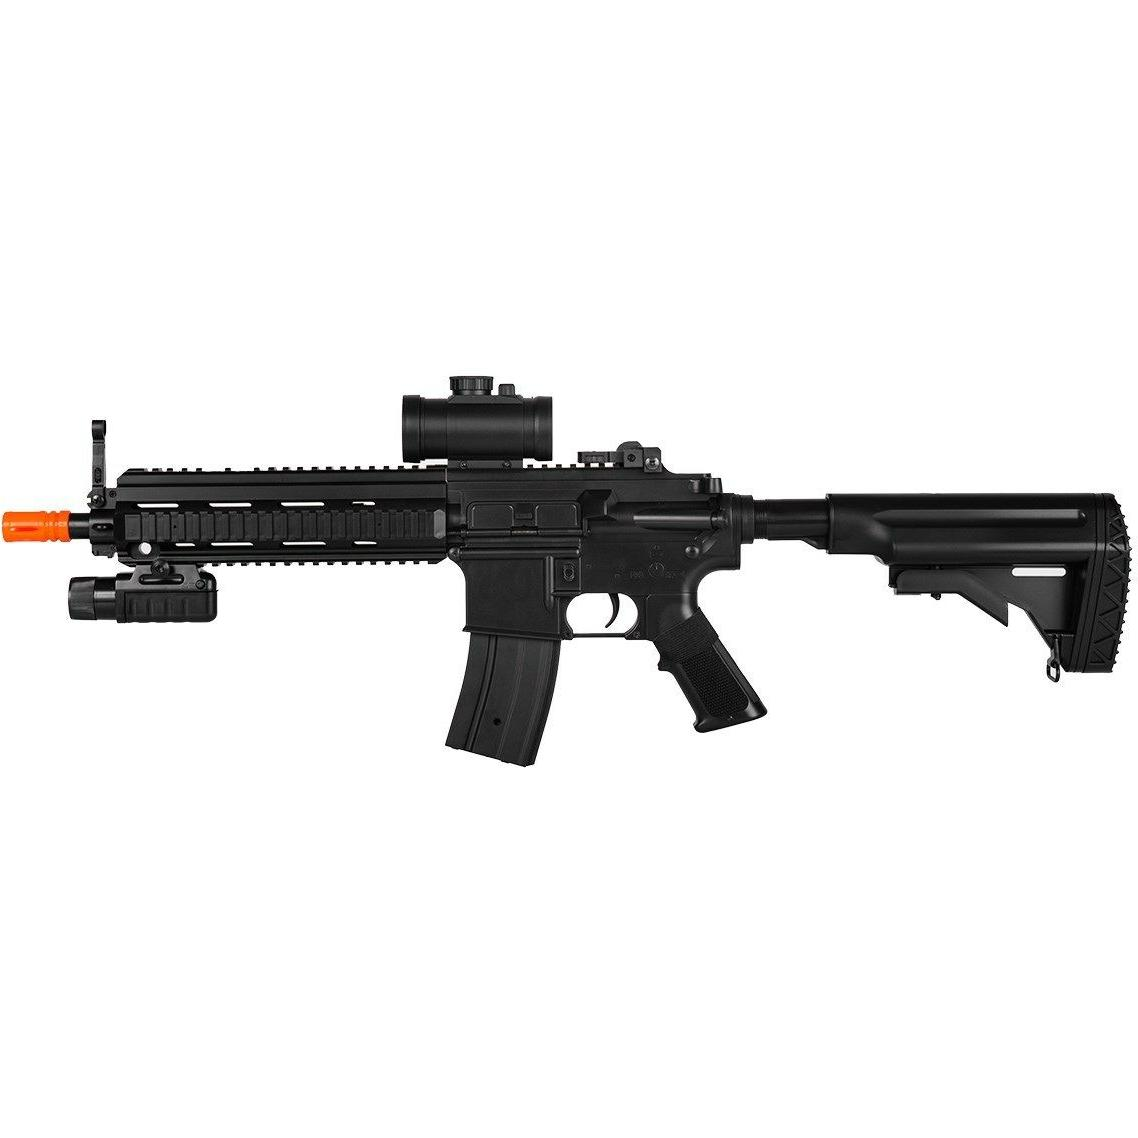 DOUBLE EAGLE M4 FULL AUTO ELECTRIC AEG AIRSOFT GUN RIFLE FLA